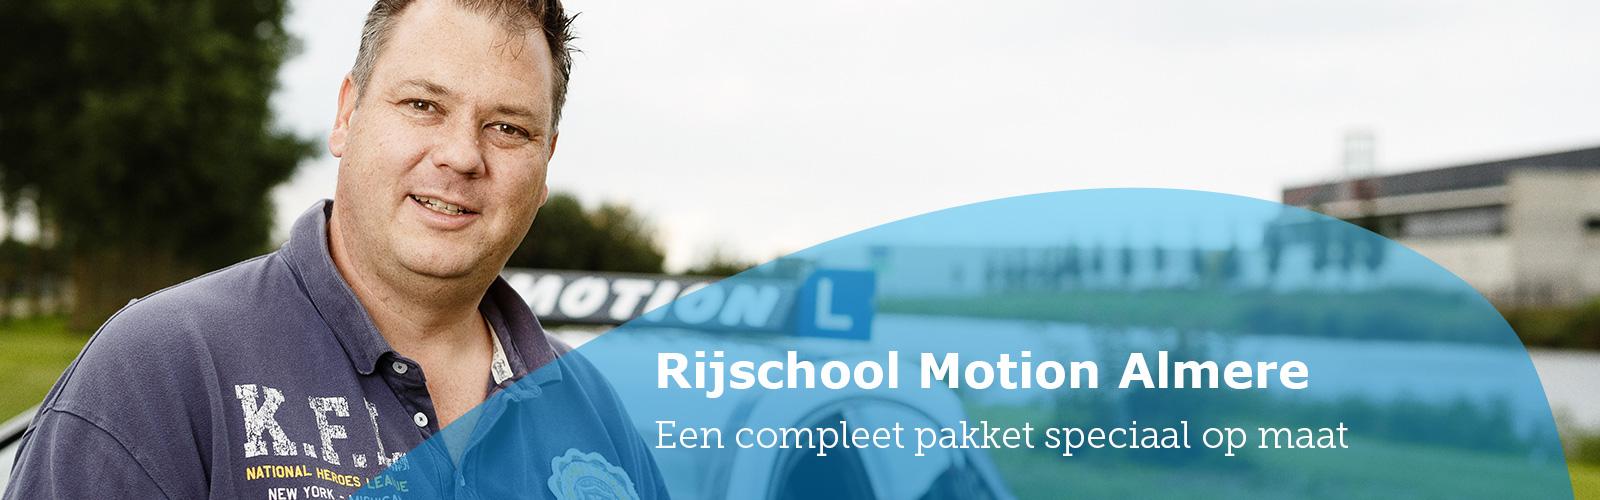 Prijzen autorijles Almere Rijschool Motion